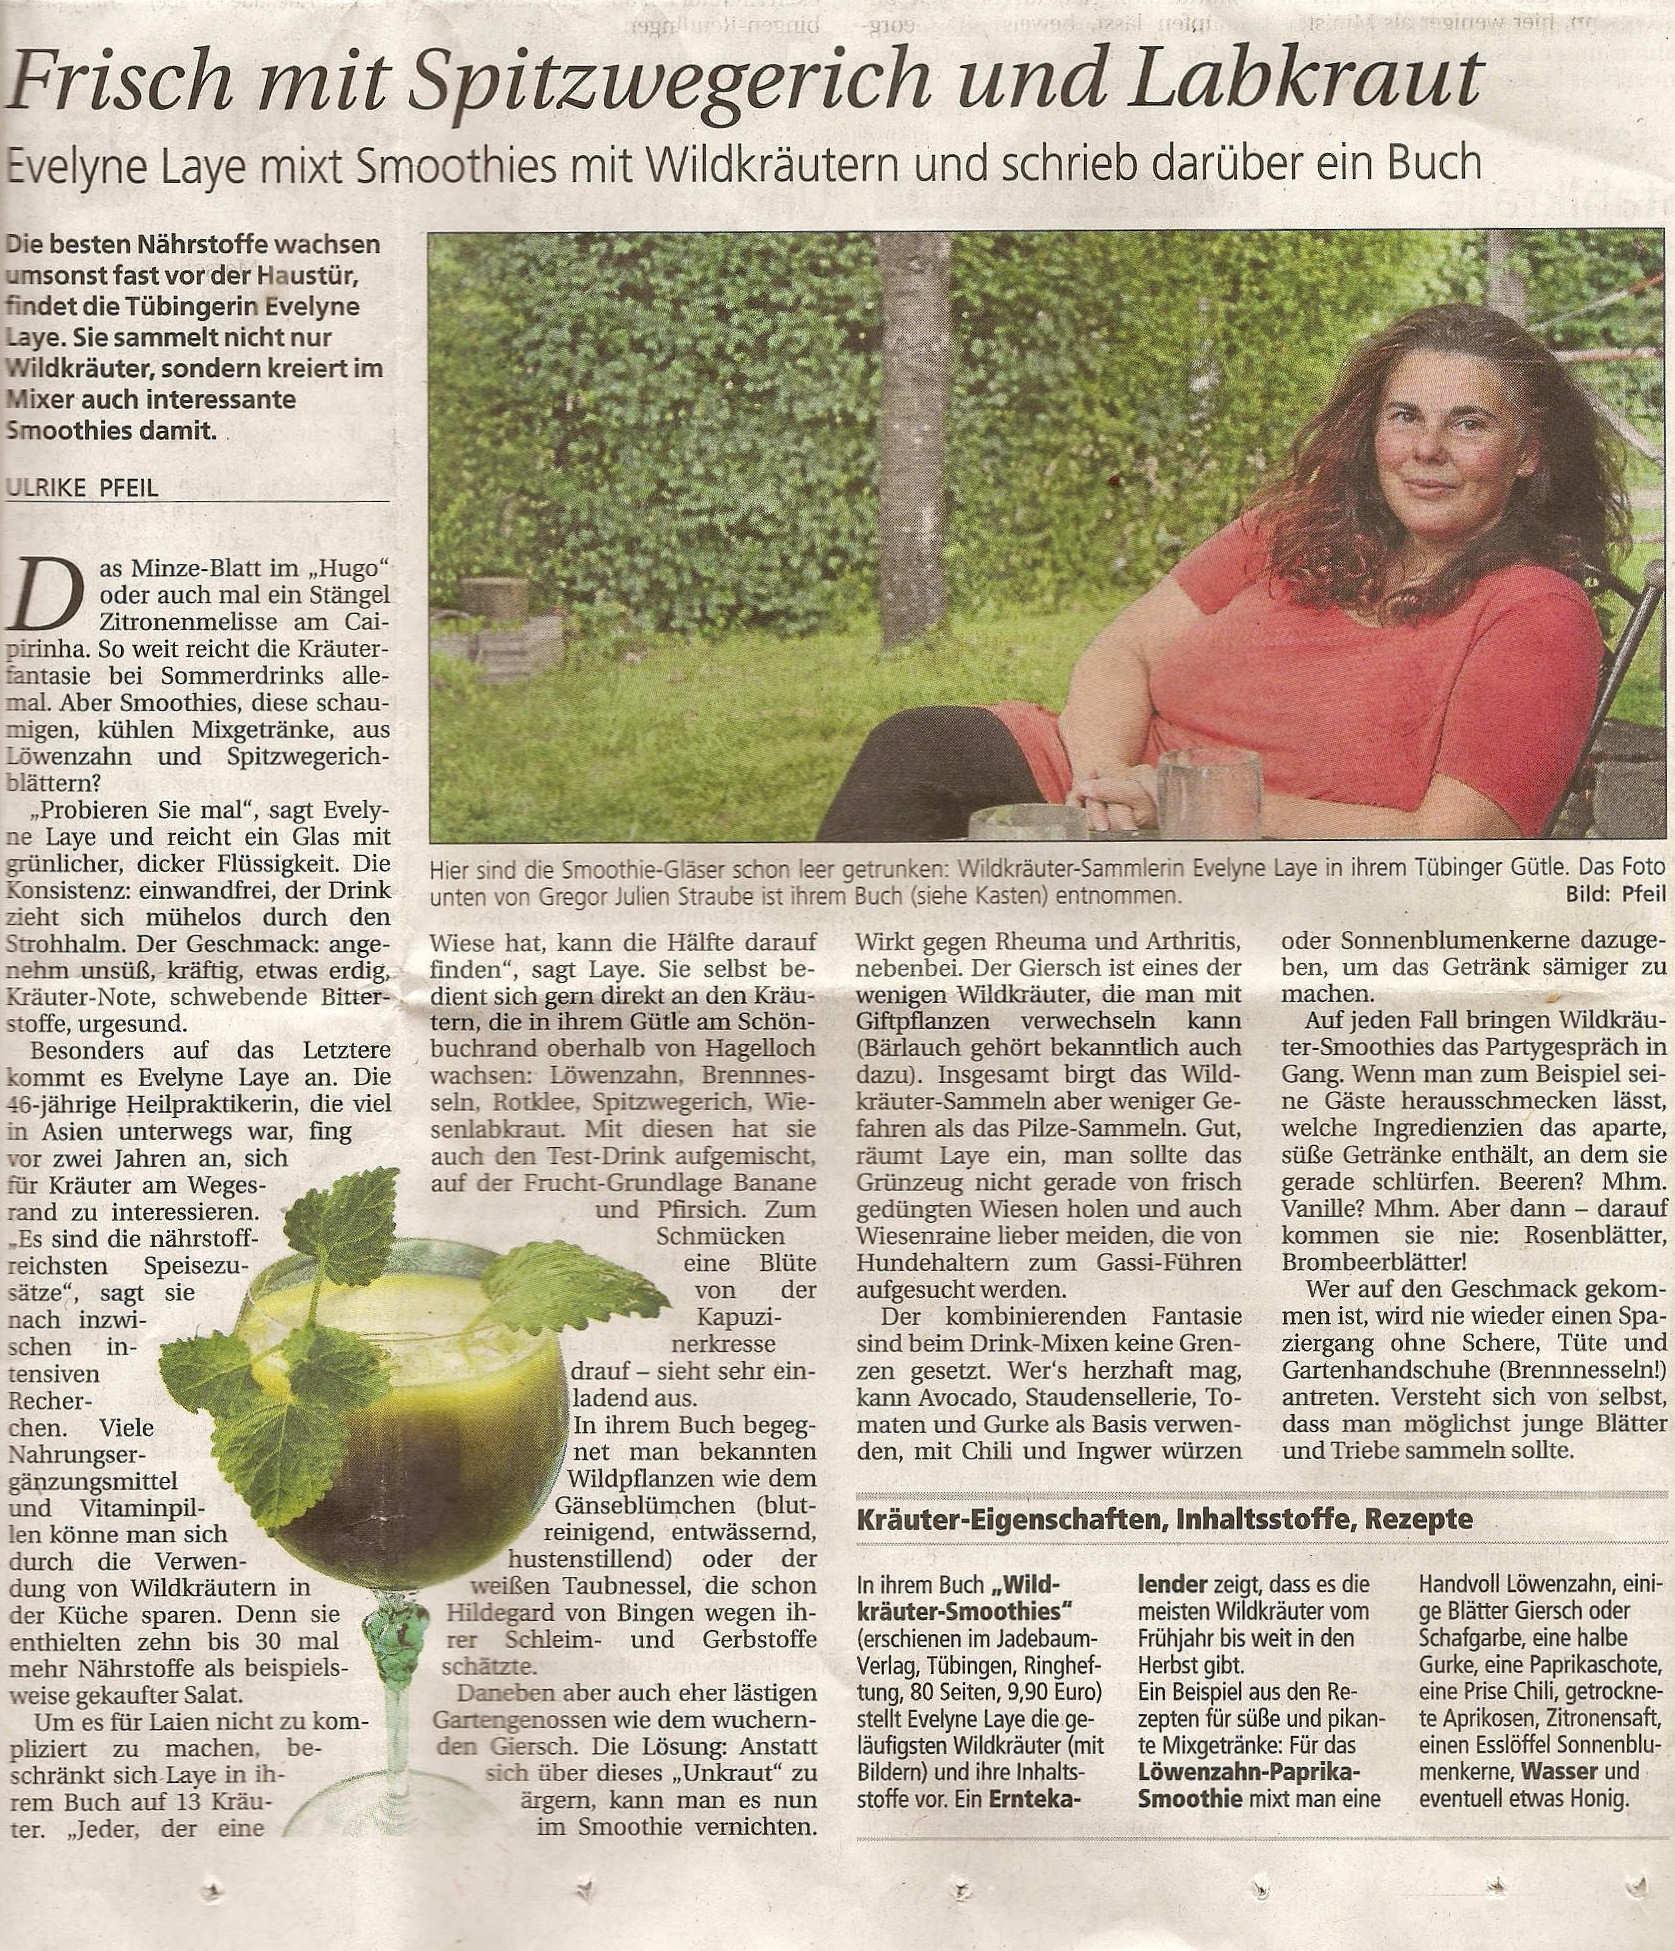 Zeitungsartikel im Tübinger Tagblatt